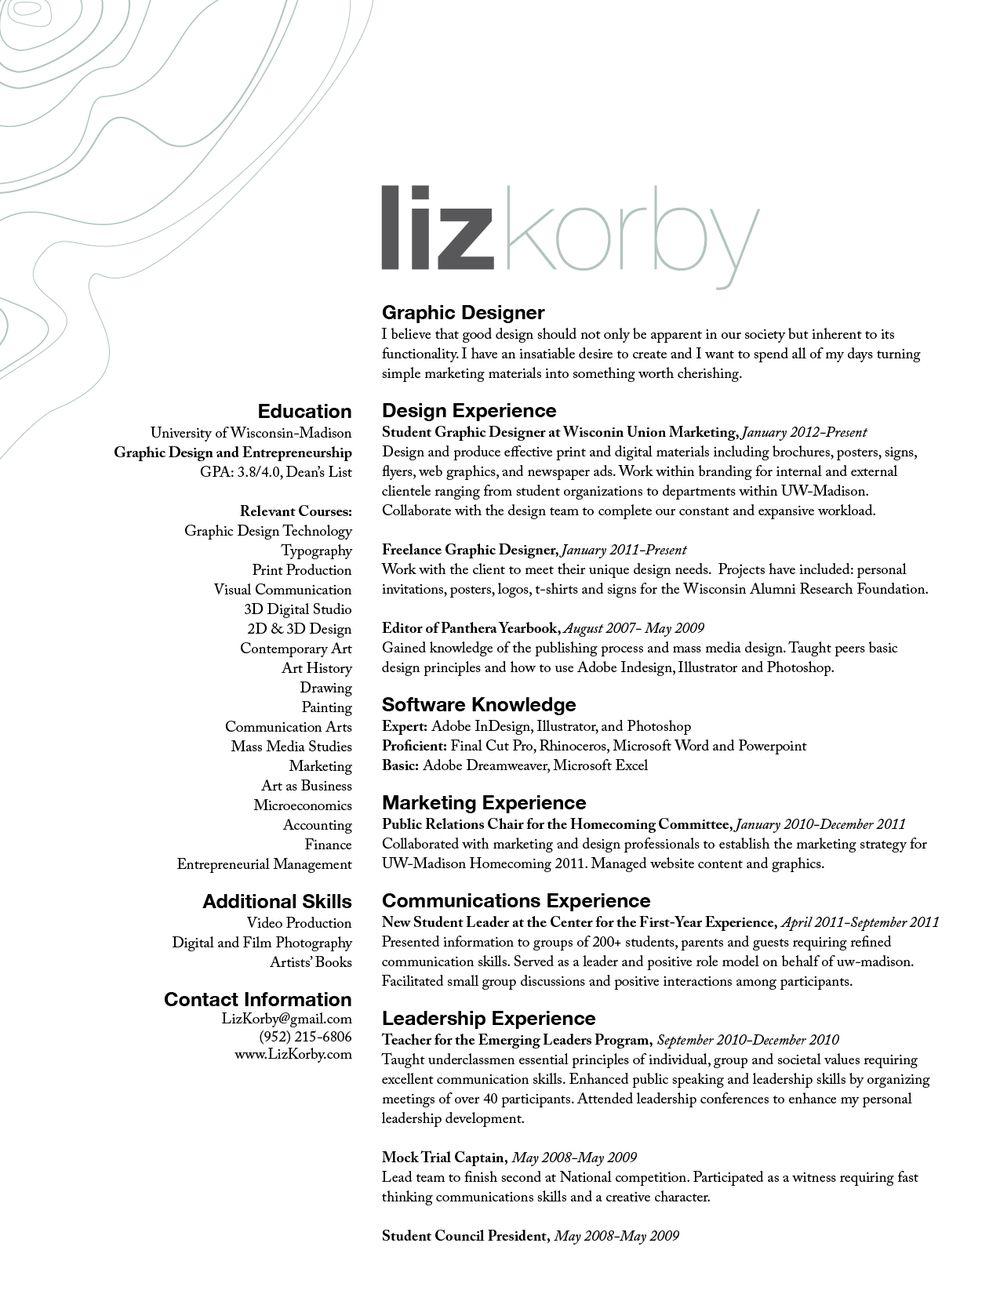 public artist resume template